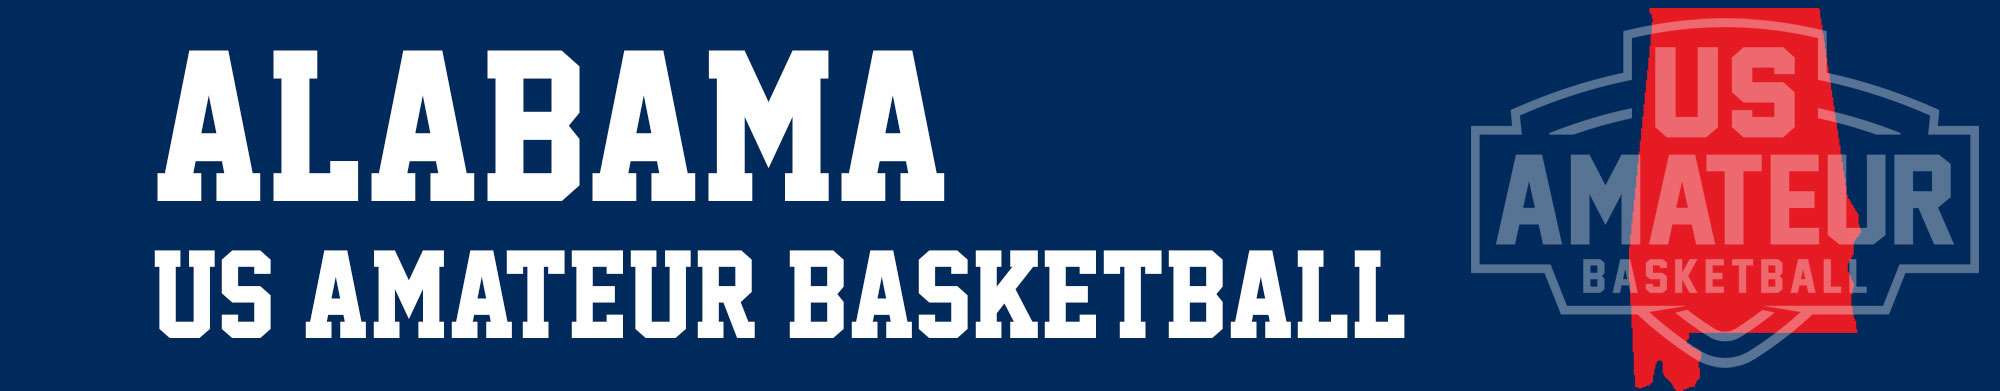 Alabama US Amateur Basketball